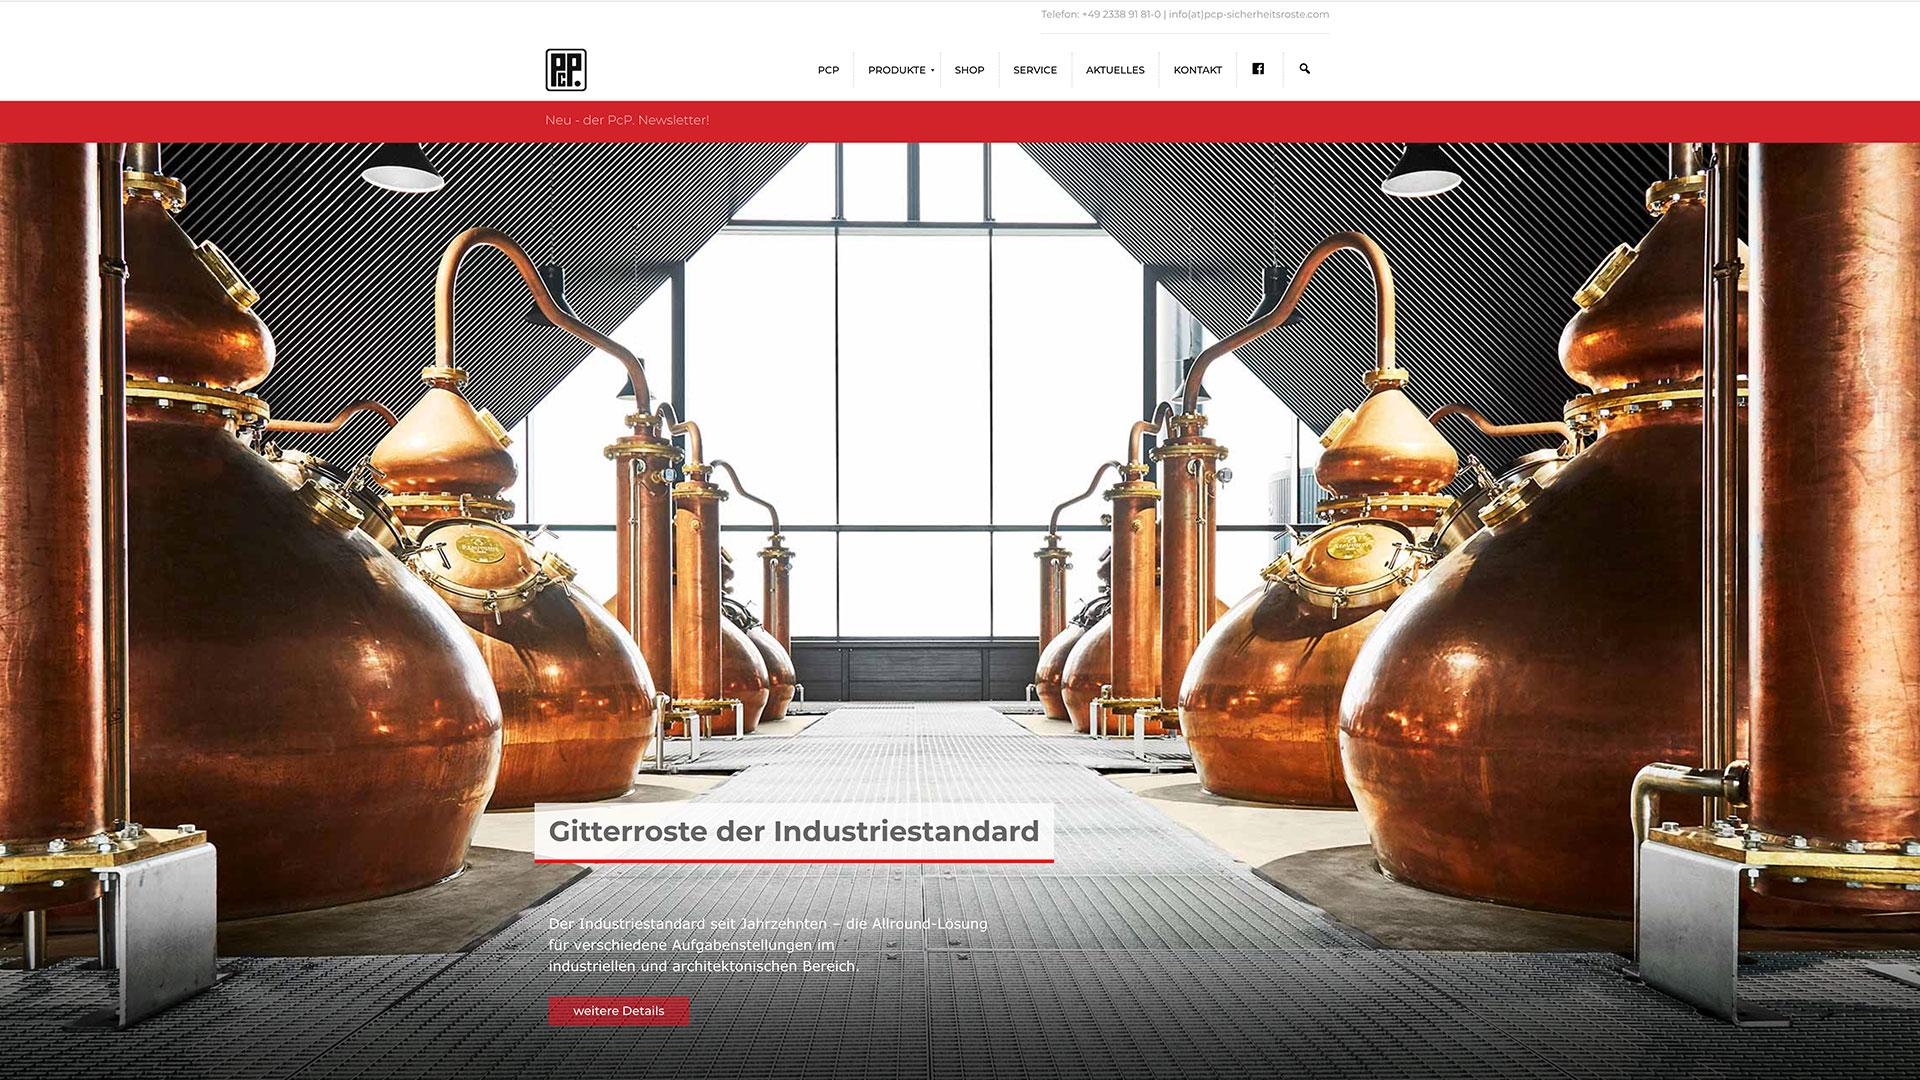 Website / Webshop PcP